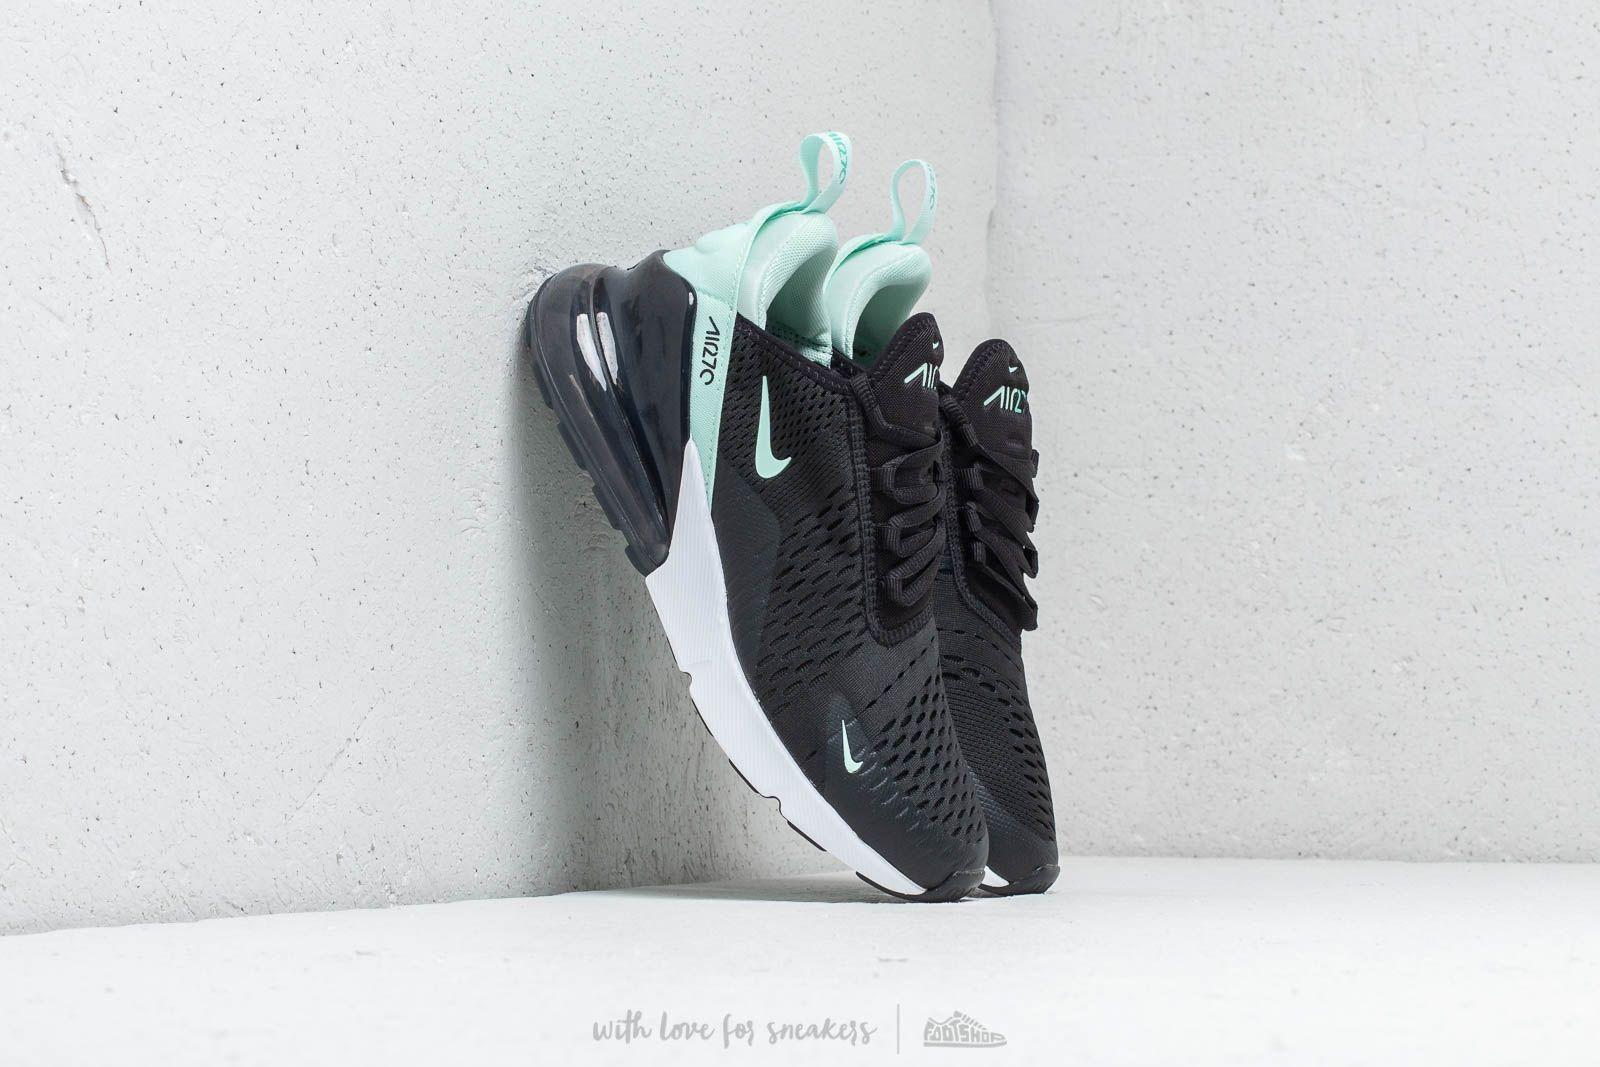 Igloo WhiteFootshop Black Turq Air Max Hyper Nike W 270 f6gb7Yy